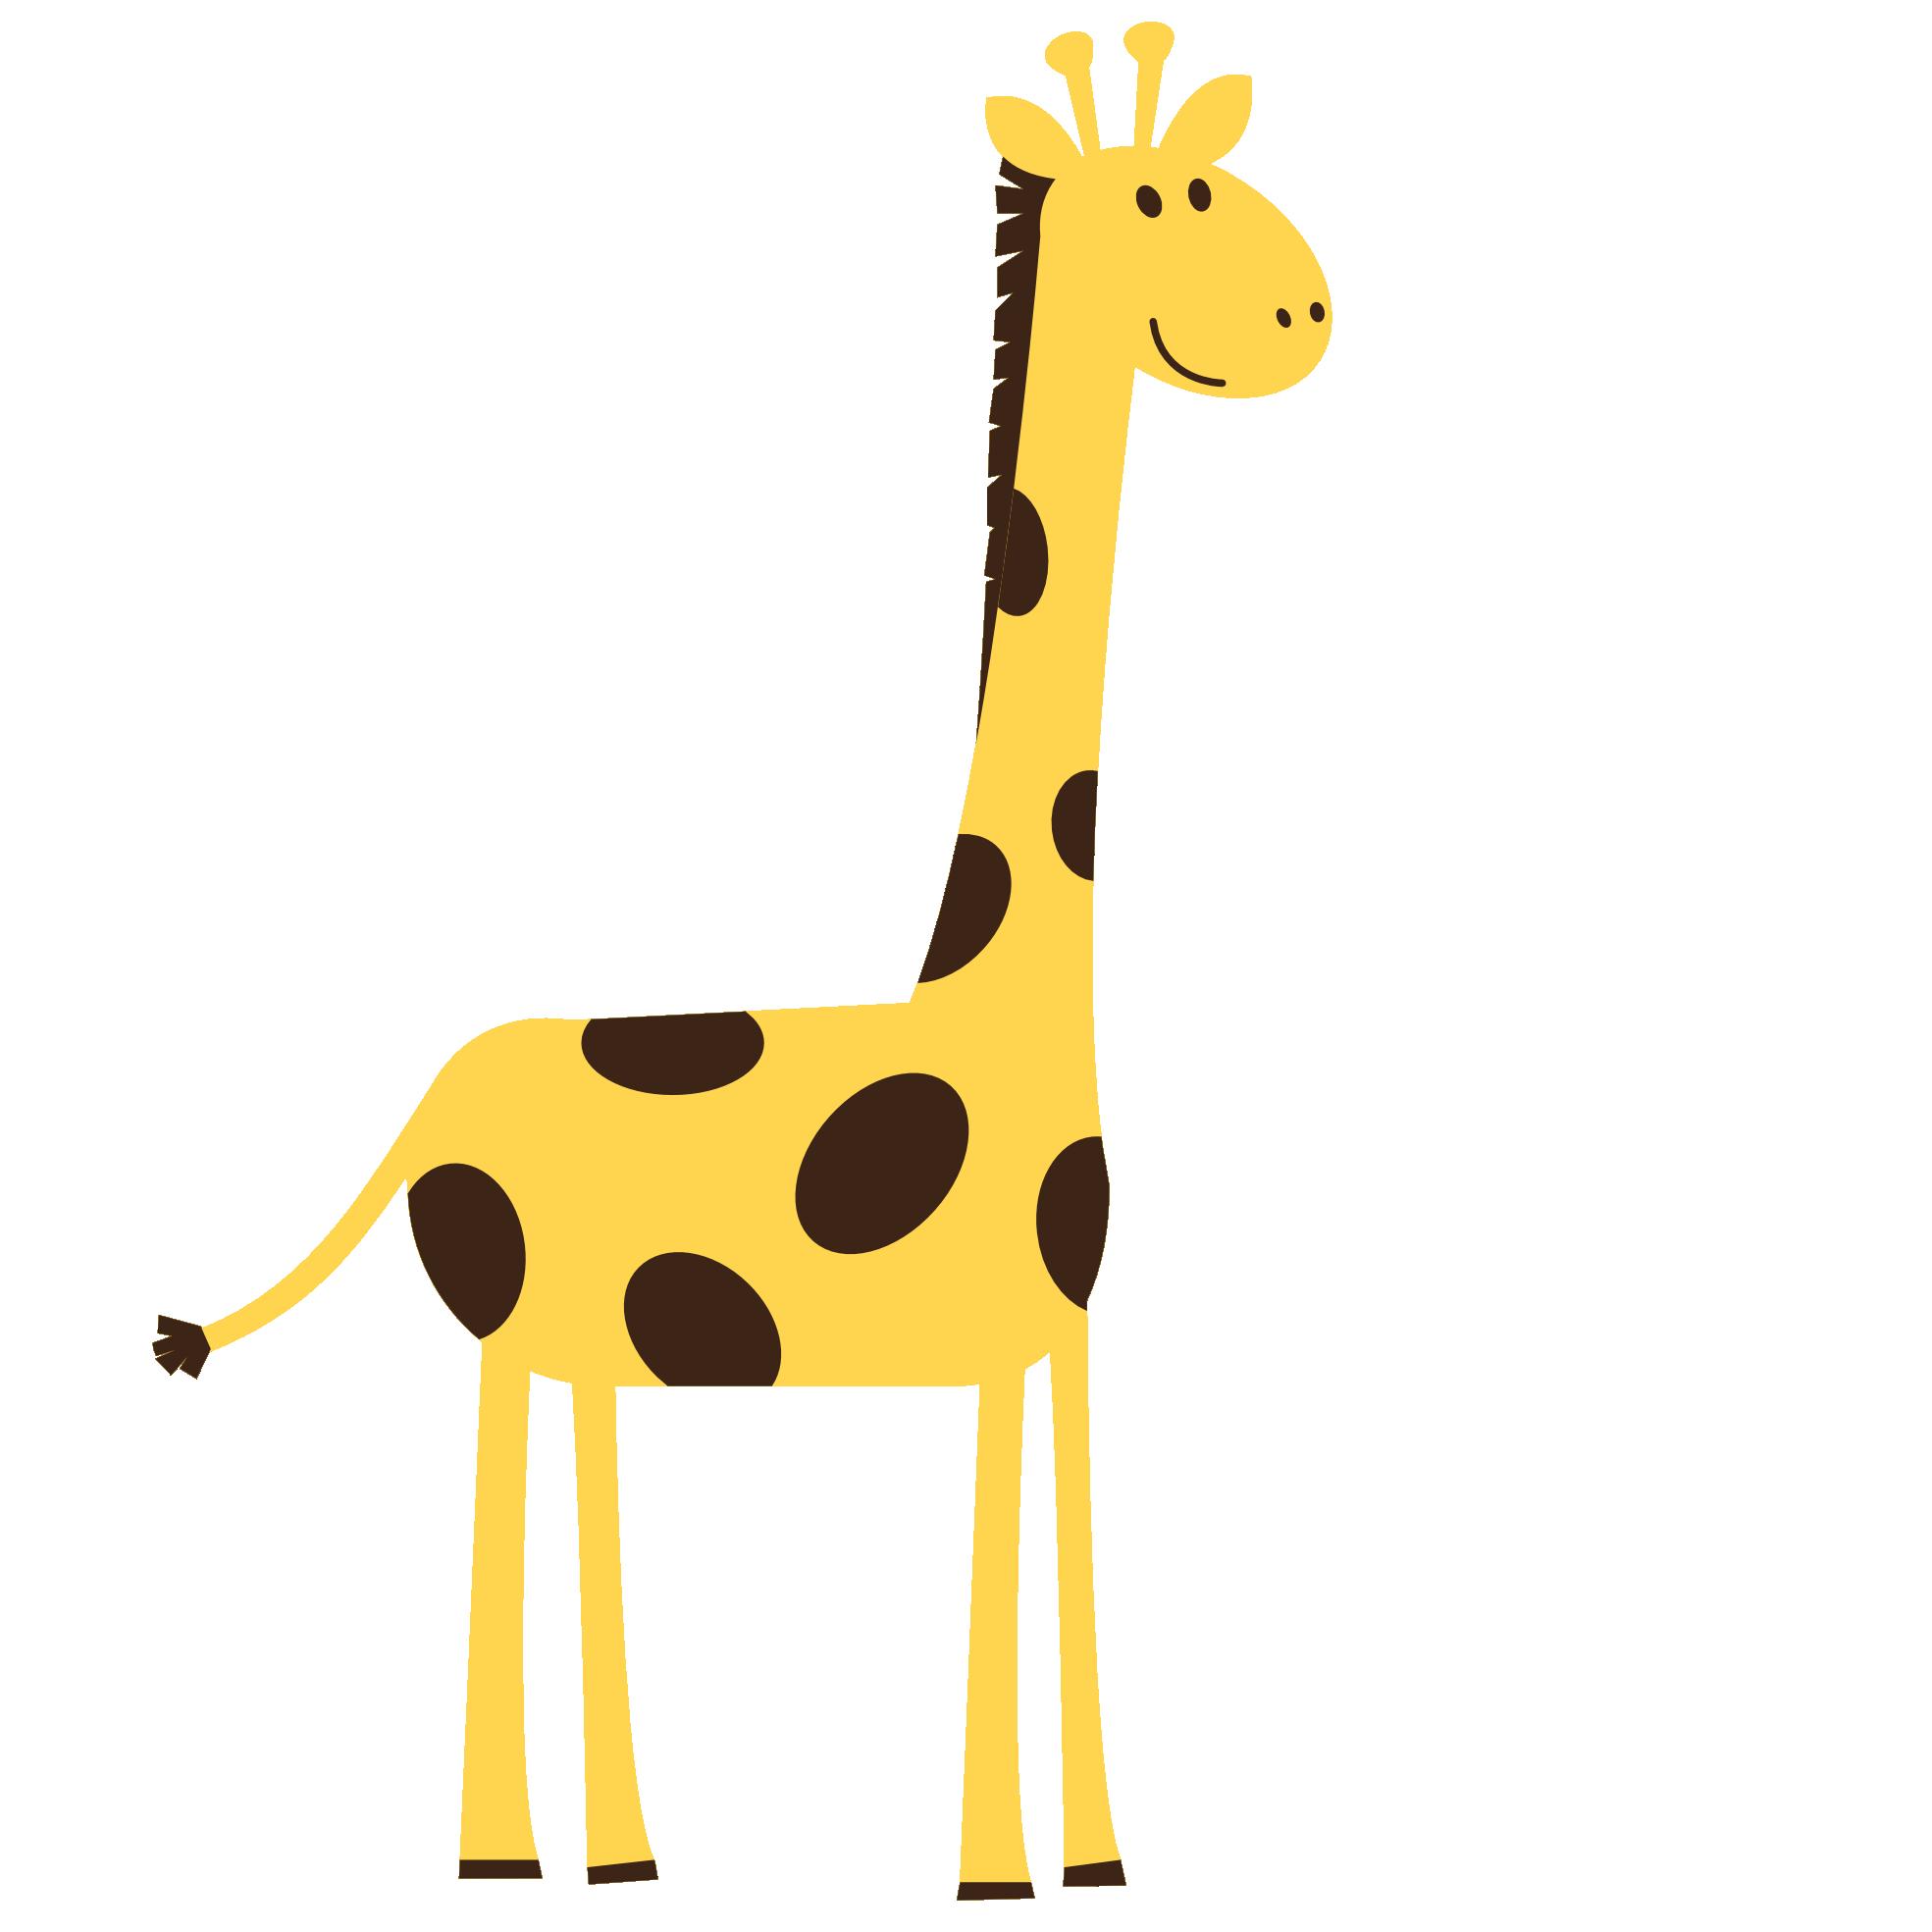 Couple clipart giraffe, Couple giraffe Transparent FREE for.